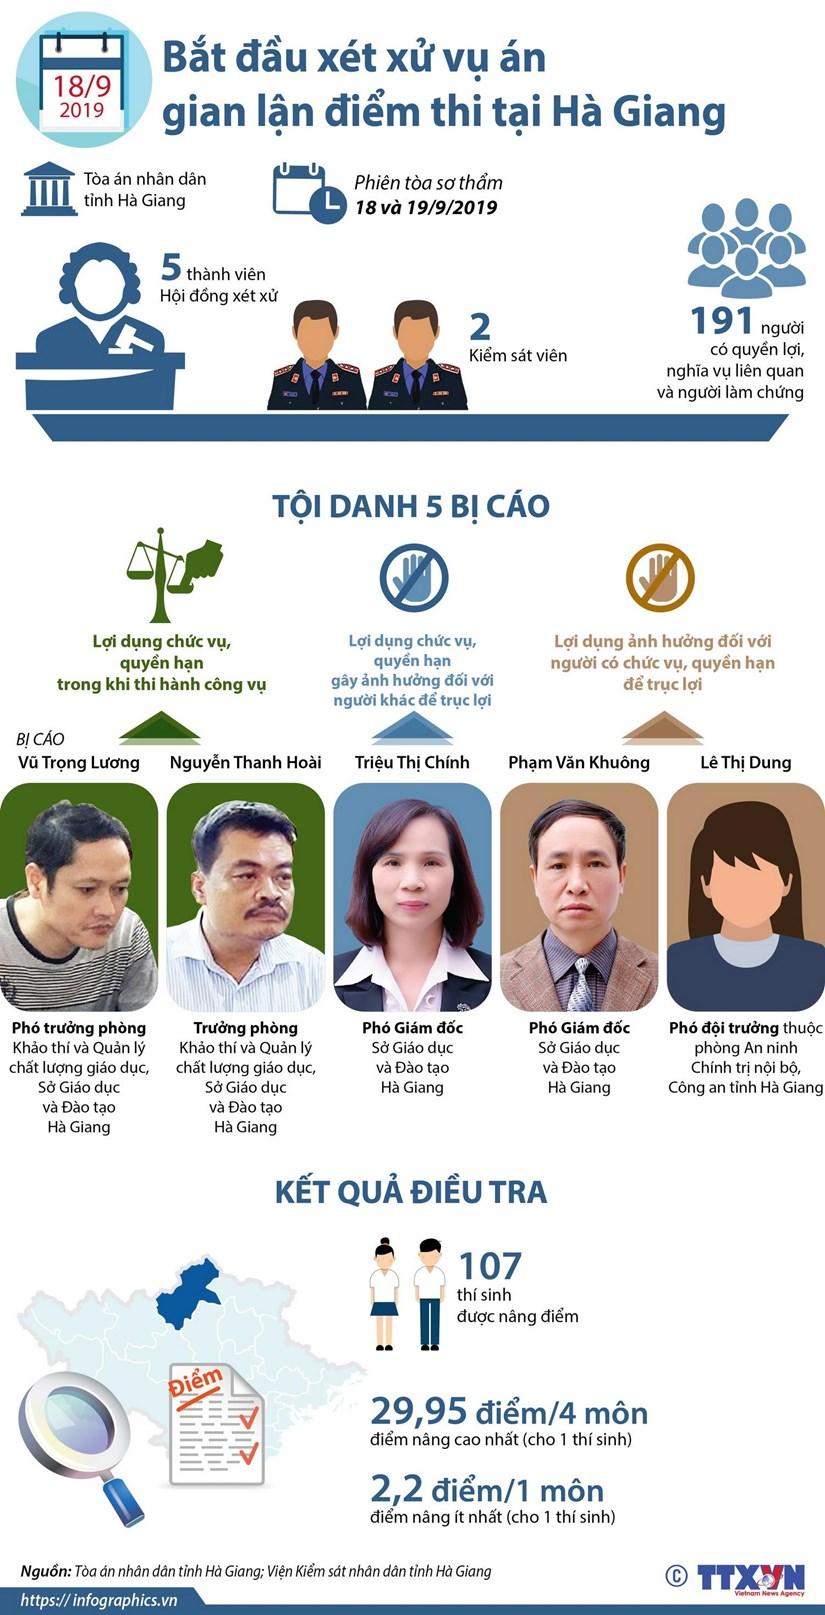 [Infographics] Hom nay, 18/9, xet xu vu gian lan diem thi tai Ha Giang hinh anh 1